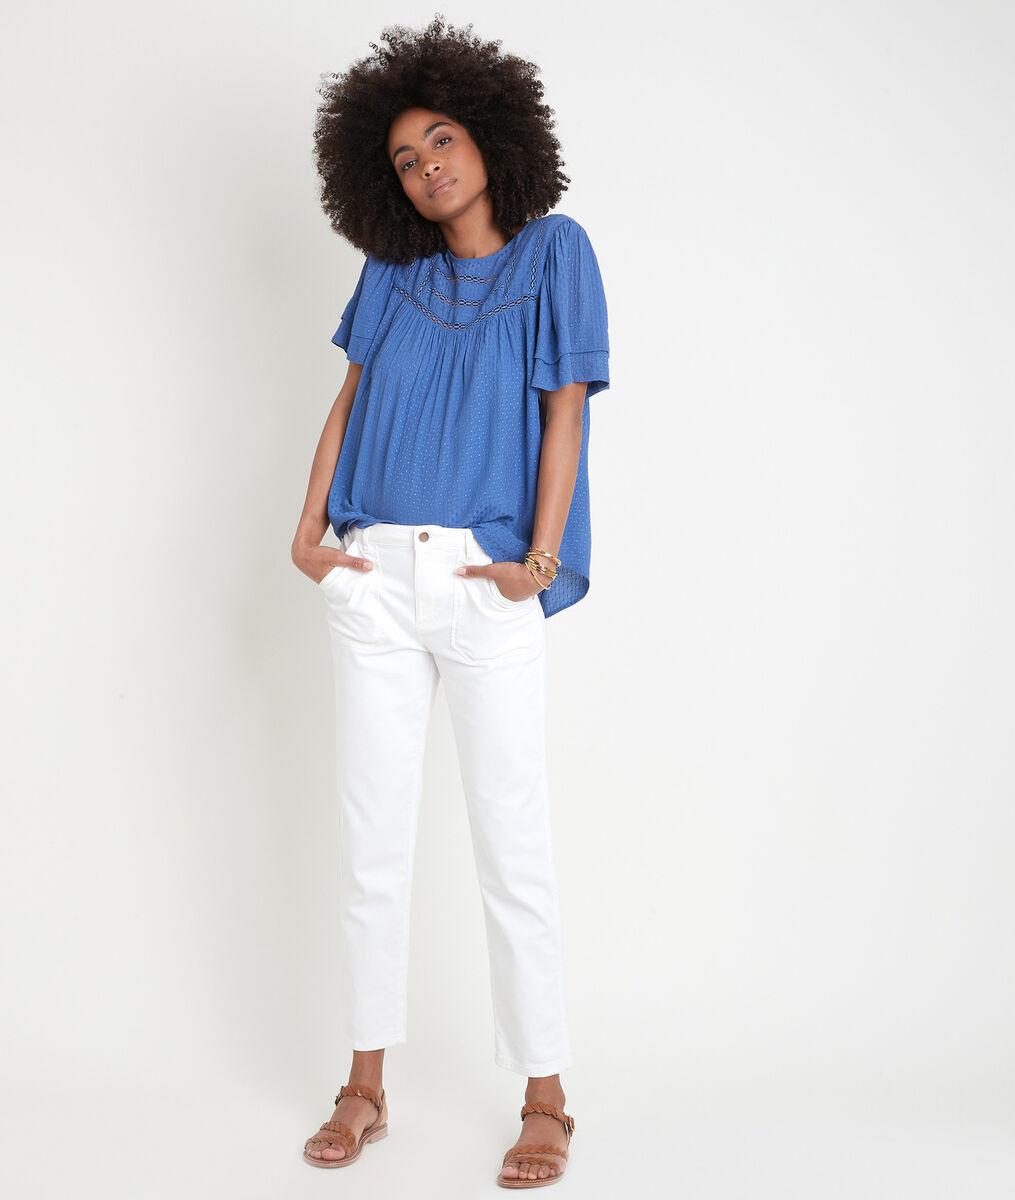 Blauwe wijde blouse met kant Abi PhotoZ | 1-2-3